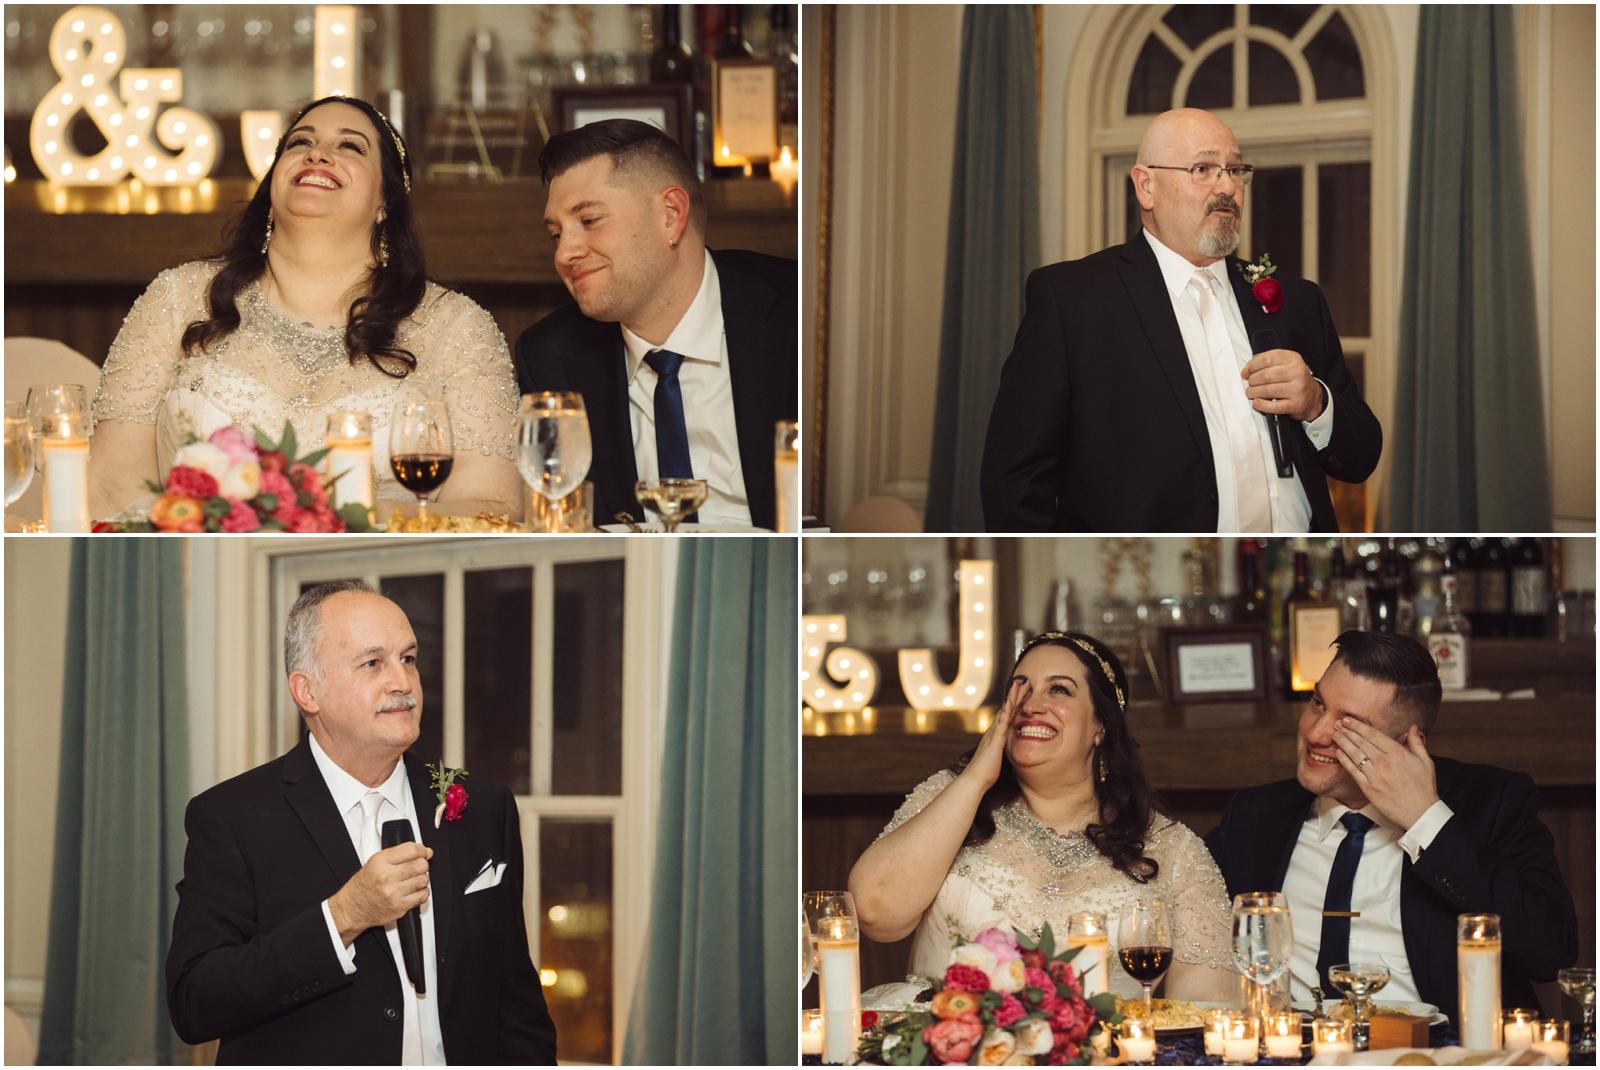 chicago_wedding_photographer-101.jpg